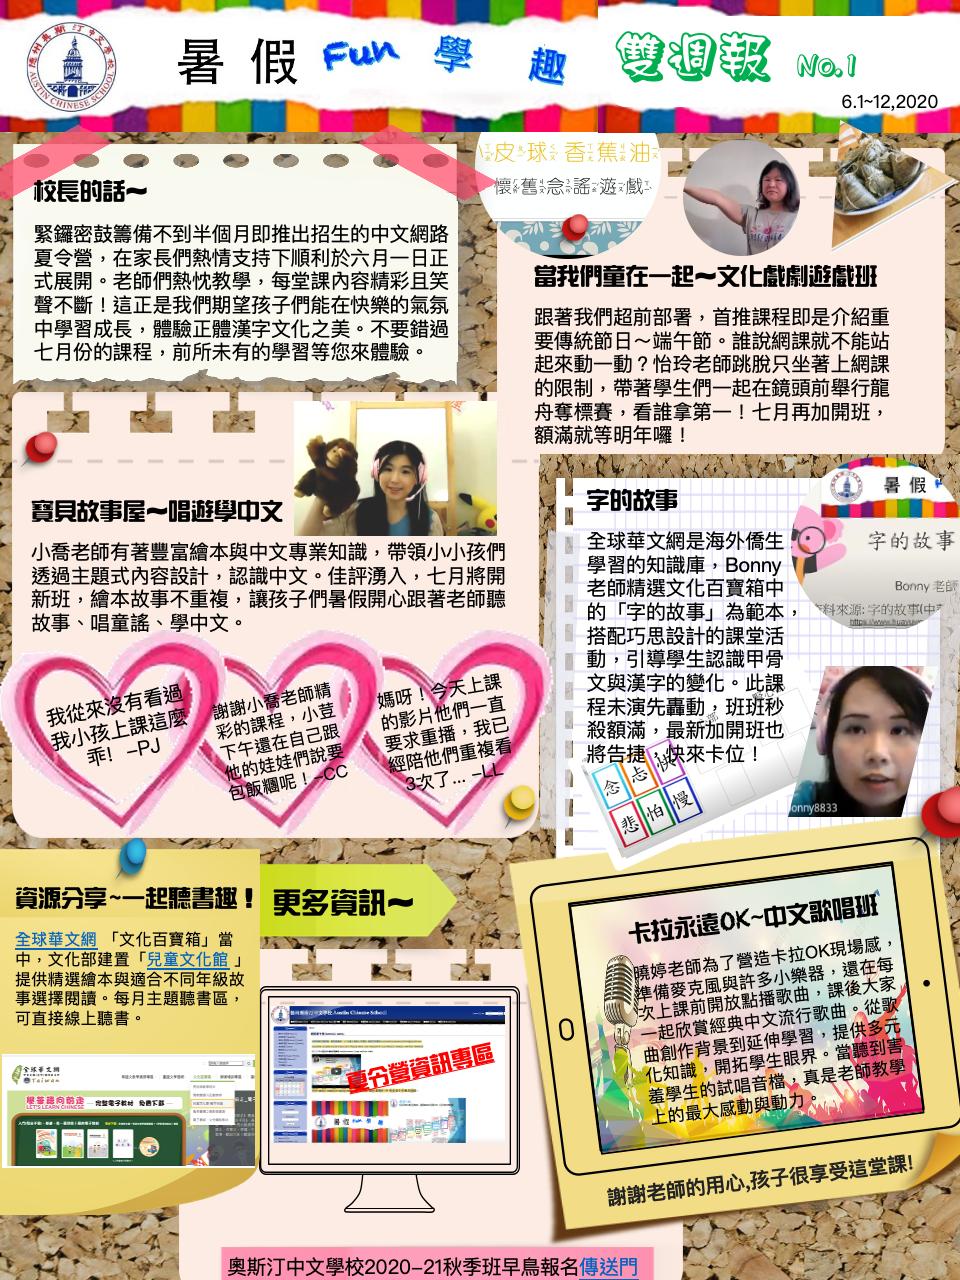 ACS2020暑假Fun學趣雙週報1_M_06152020